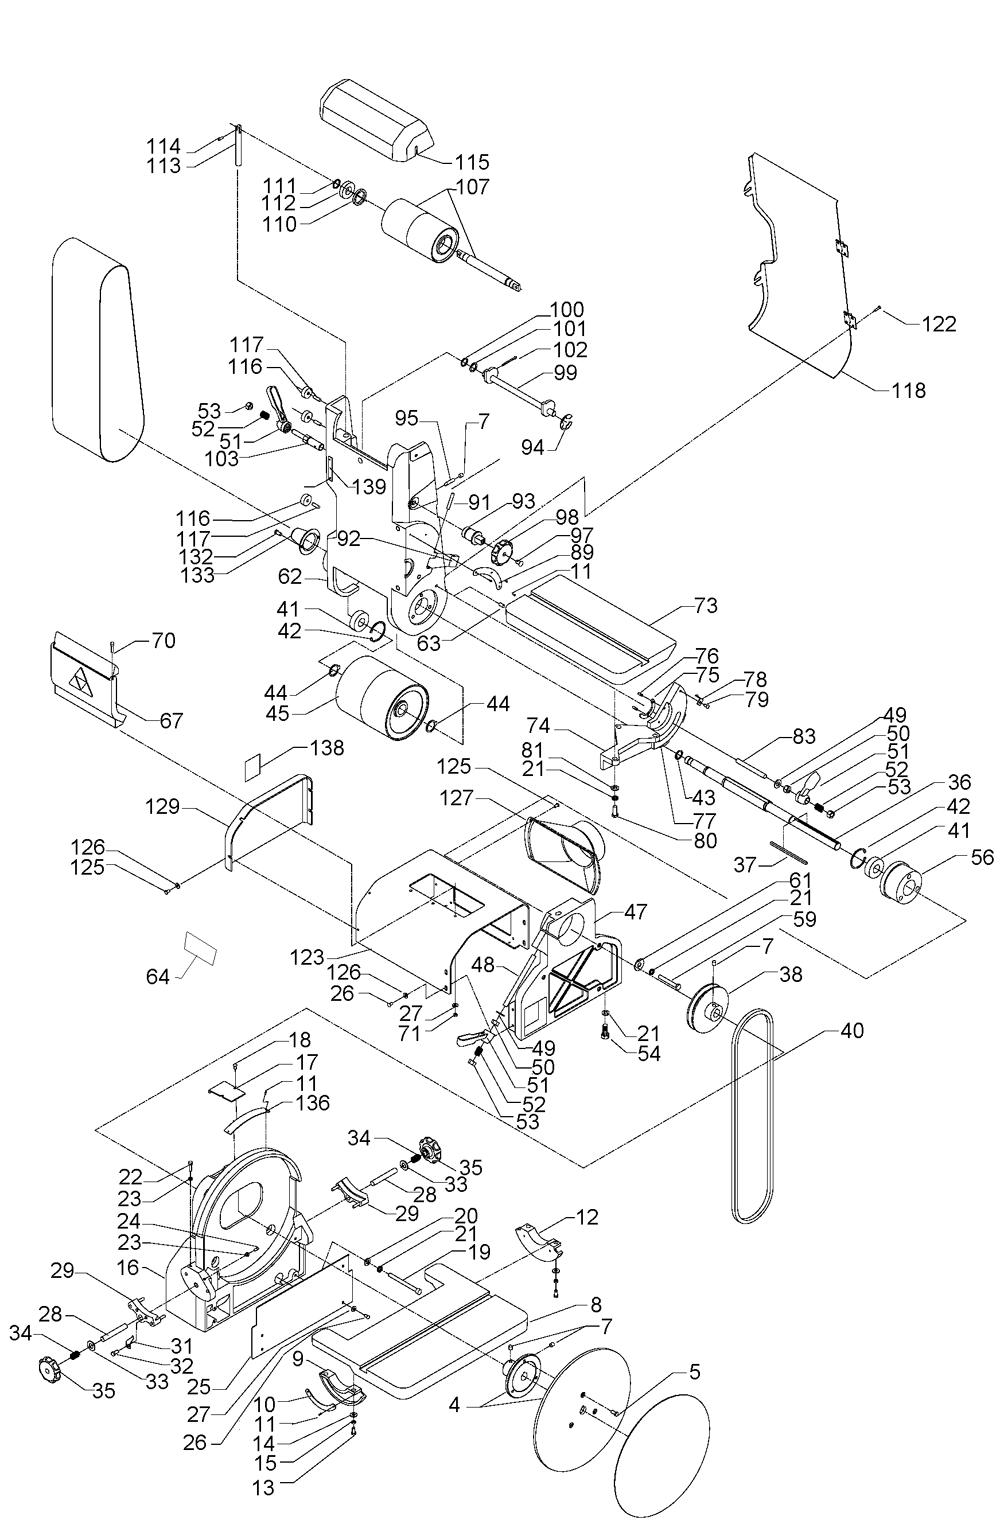 belt sander parts diagram. delta 31-300 type-1 parts schematic belt sander diagram